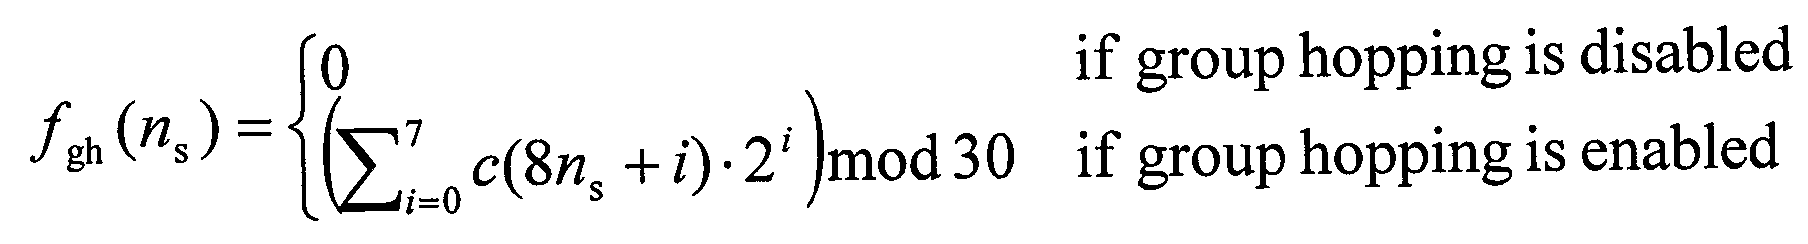 Figure 112011500951185-pat00096